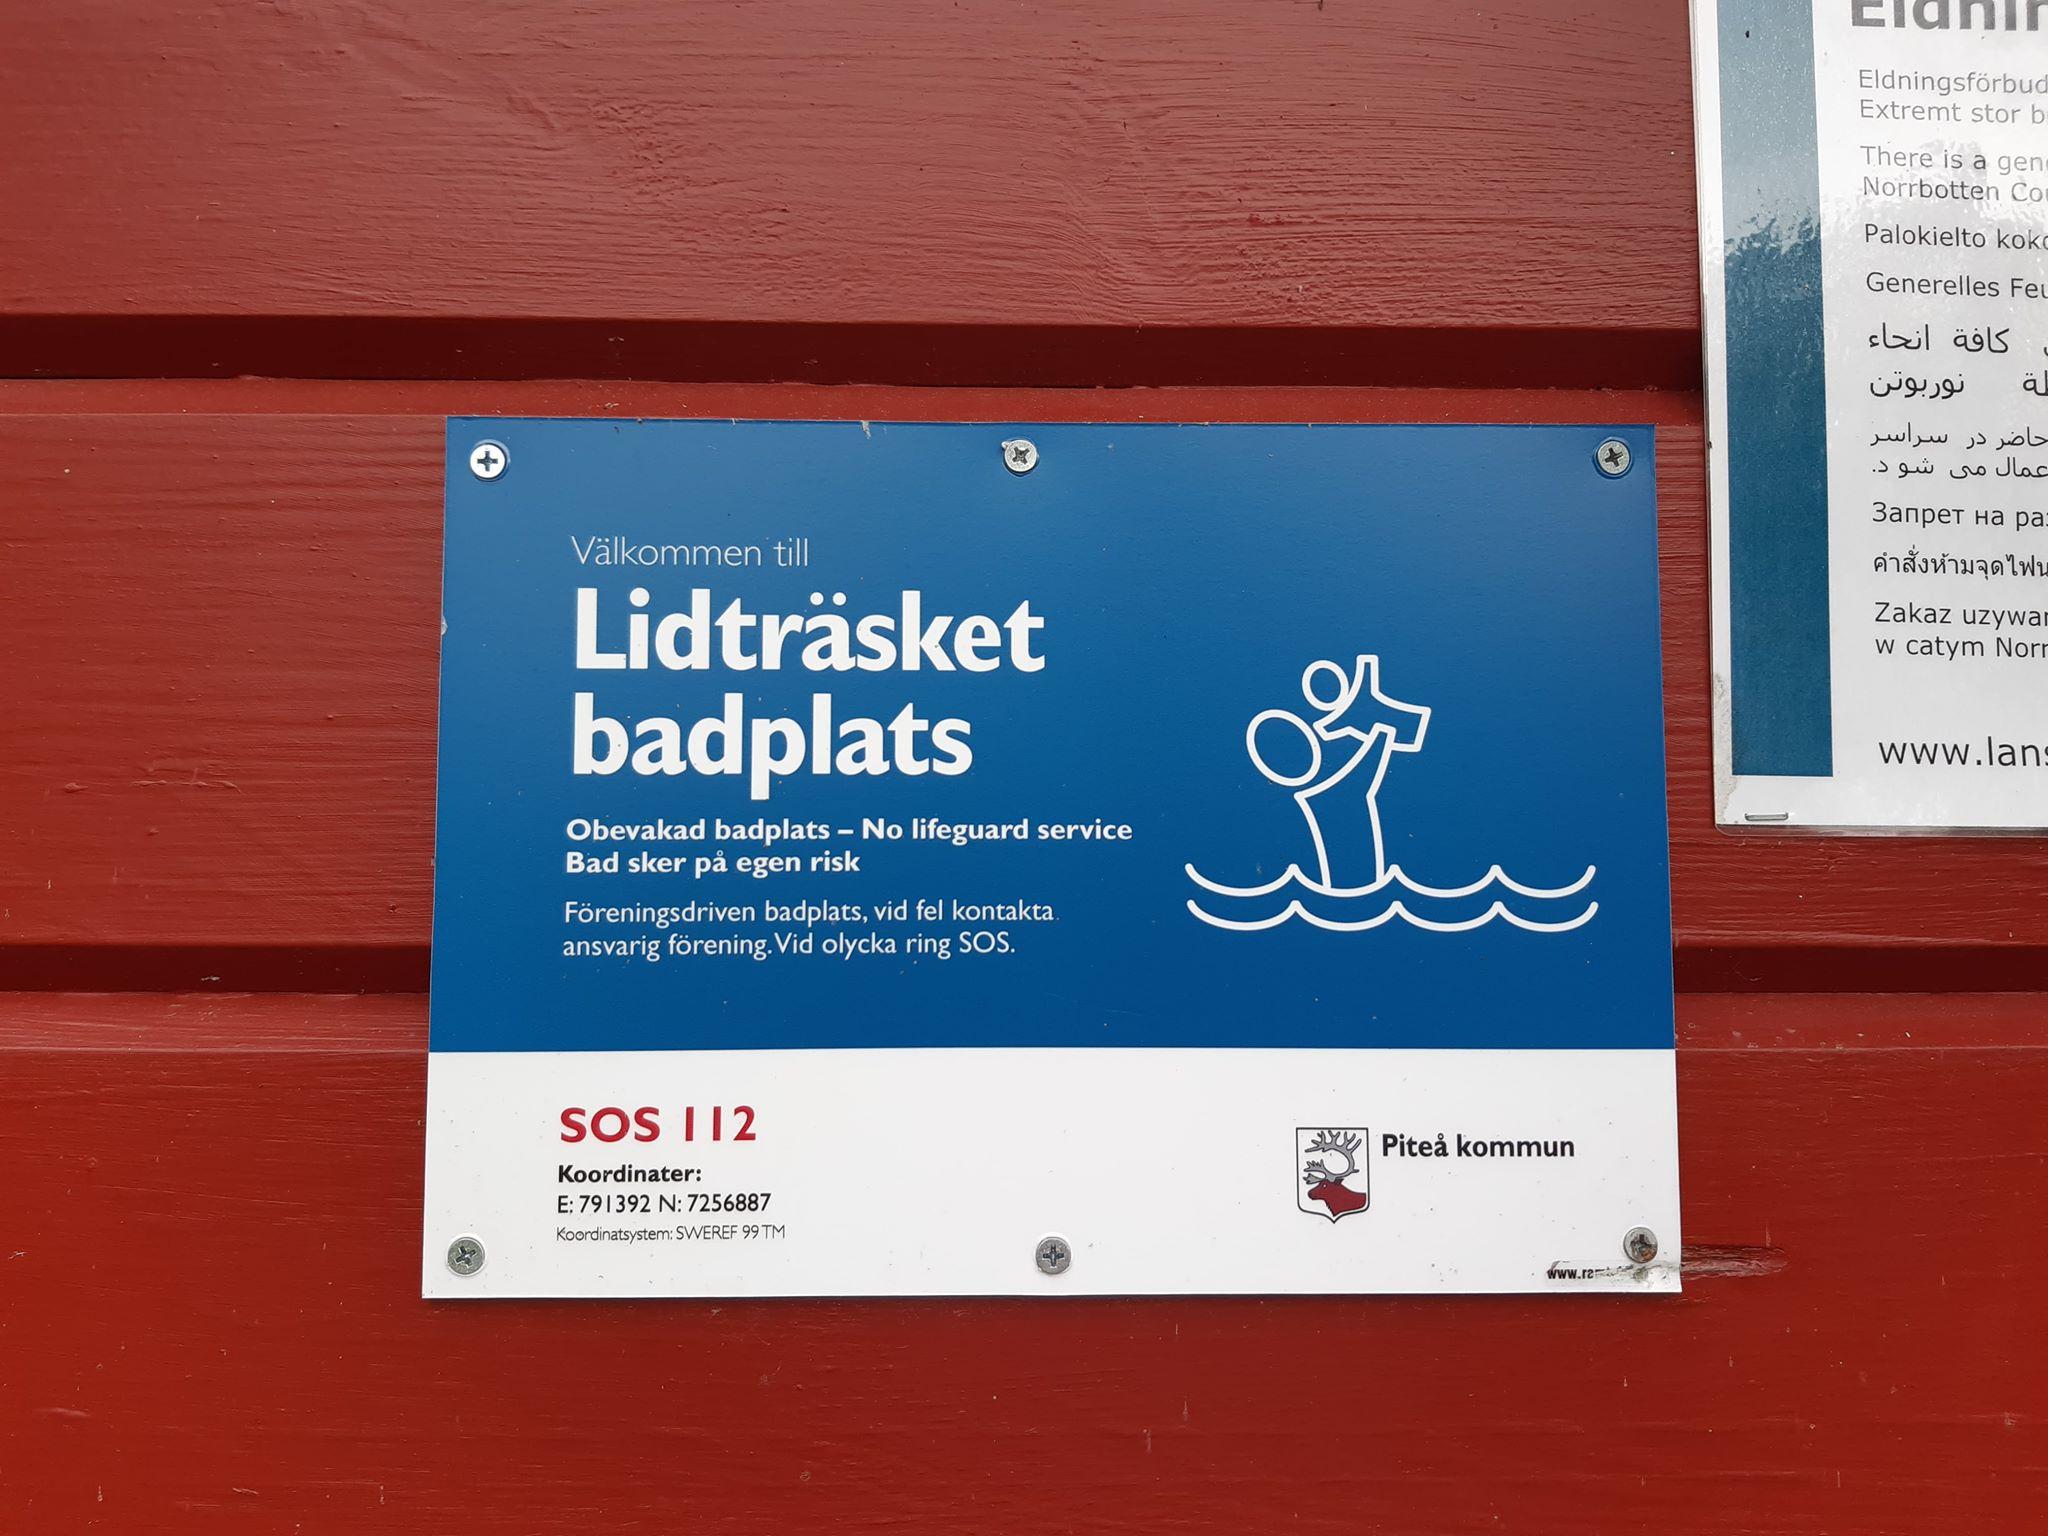 Lidträsket badplats infoskylt - Brith Fäldt